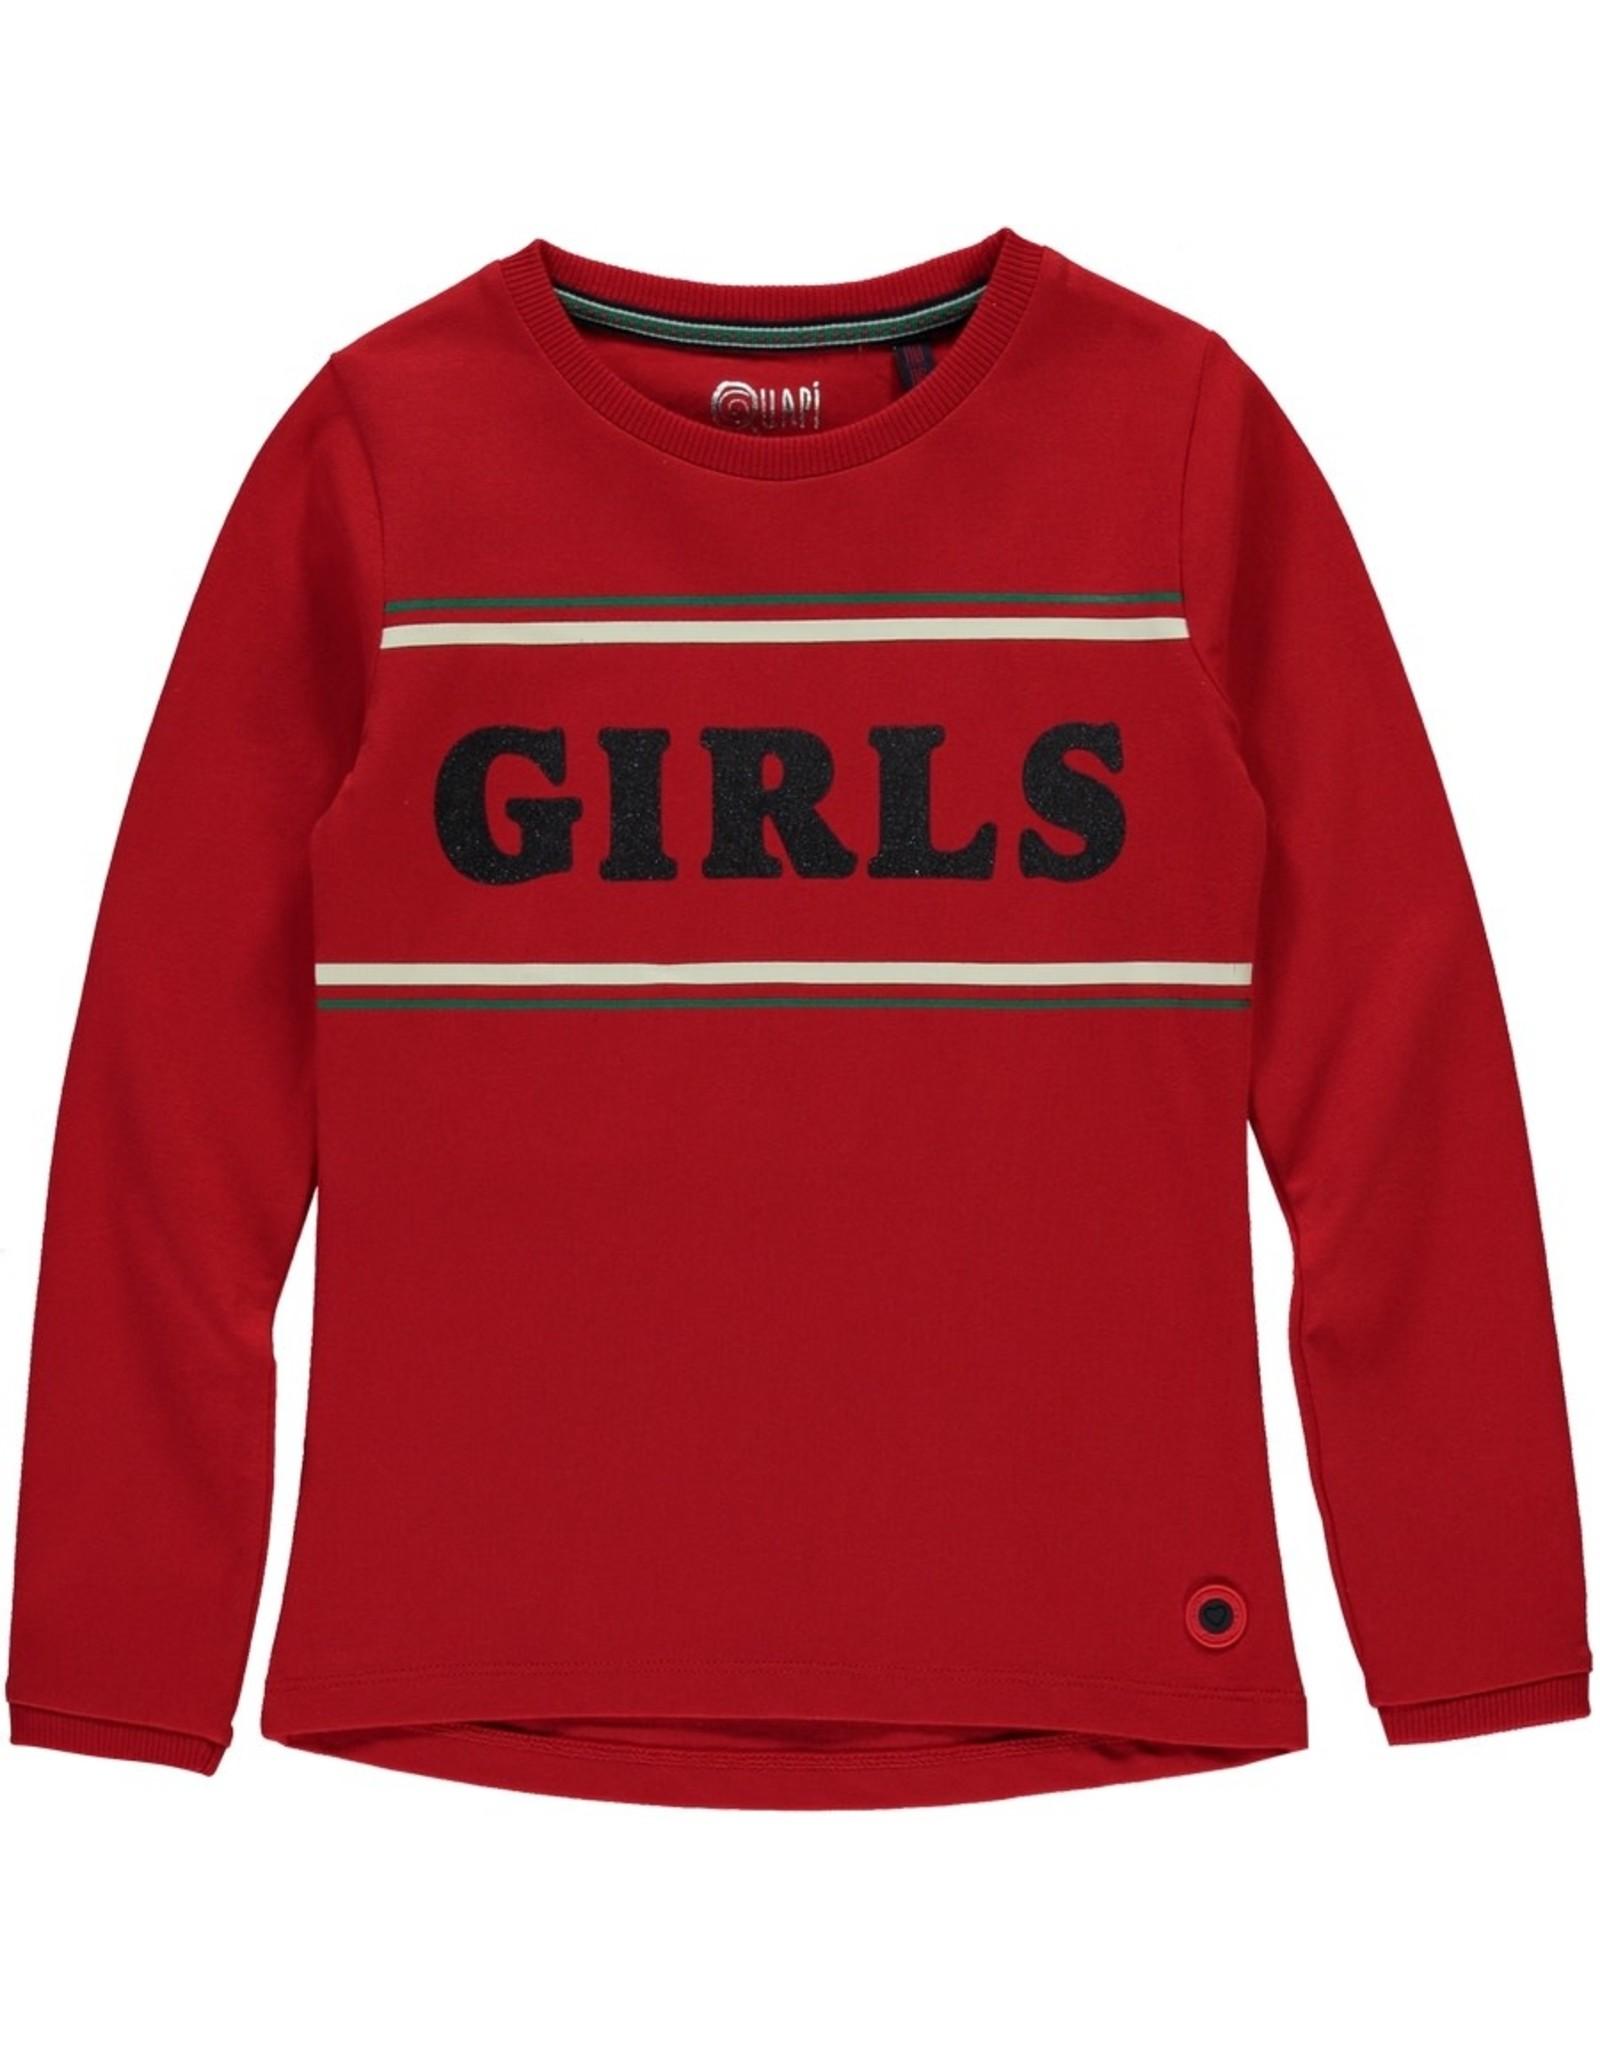 Quapi Quapi meisjes shirt Tanaya Lollipop